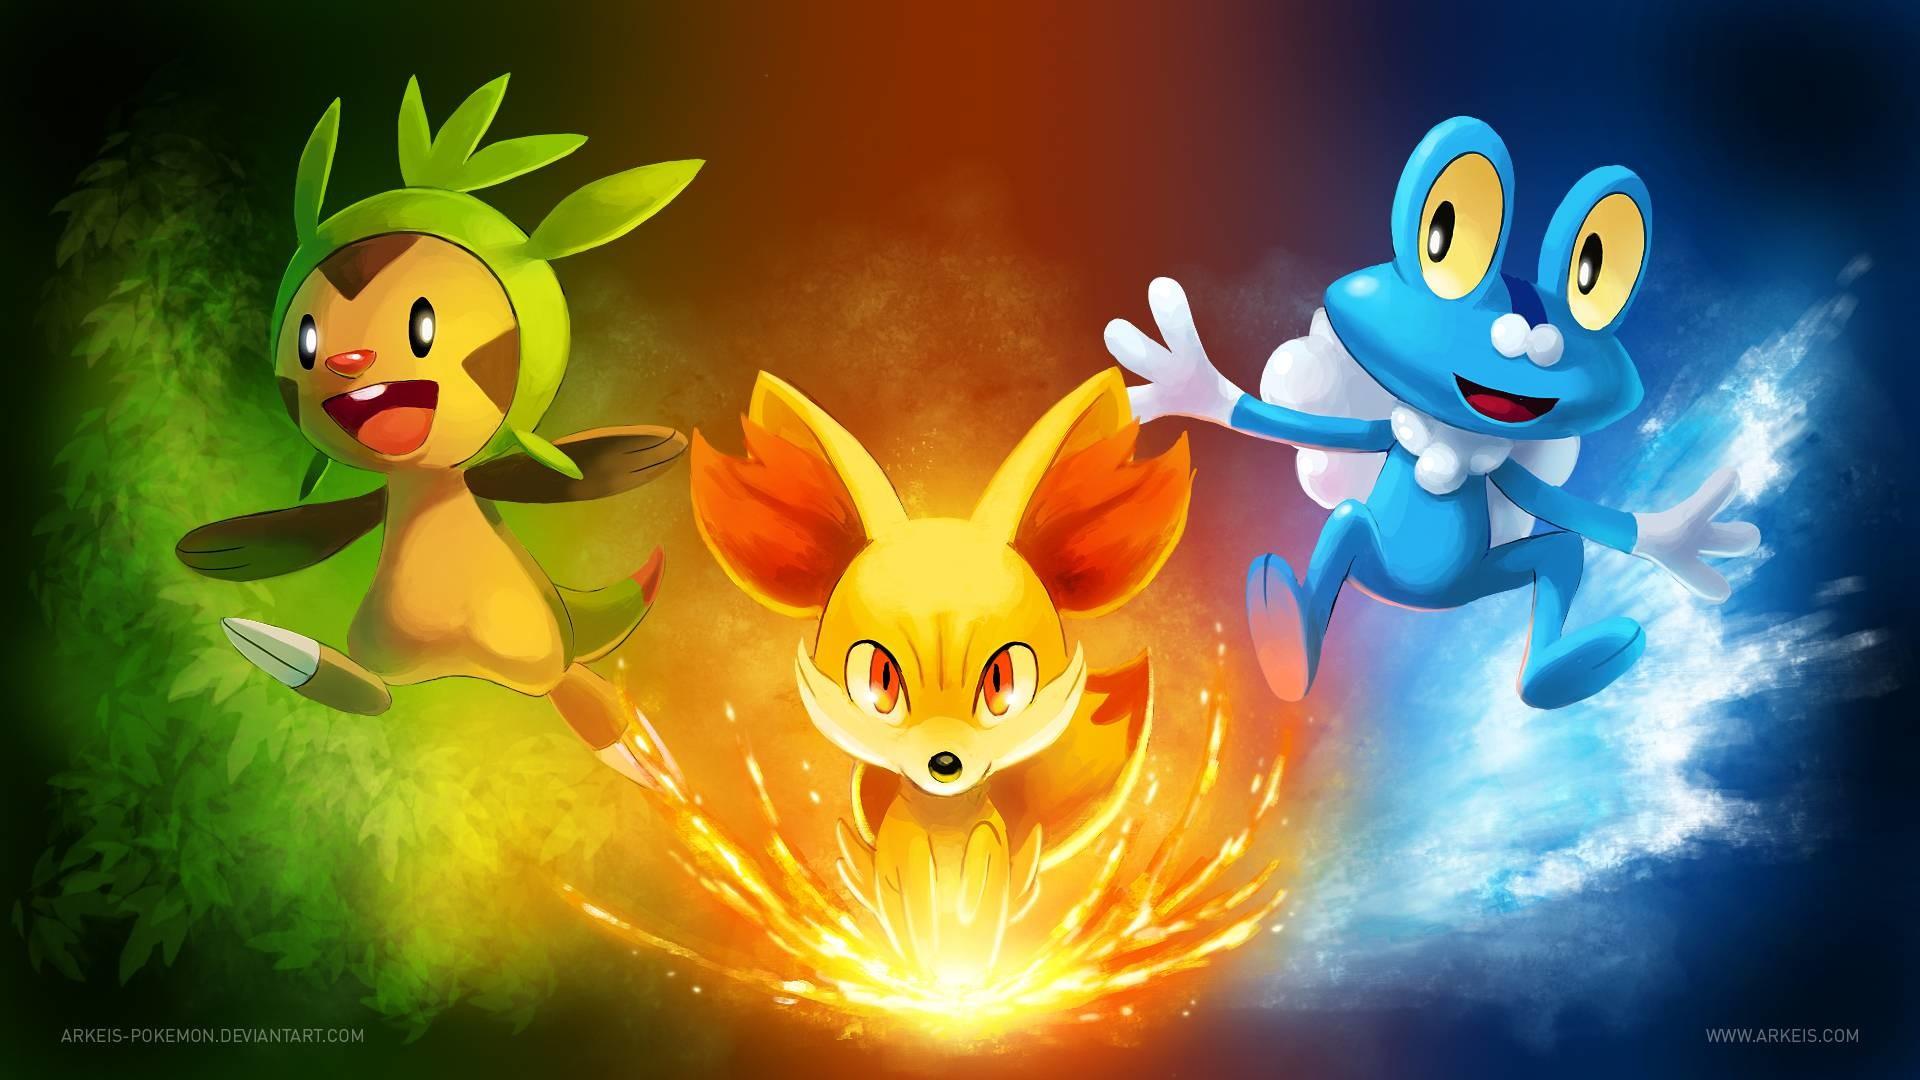 pokemon x and y hd wallpaper Â« GamingBolt.com: Video Game News .